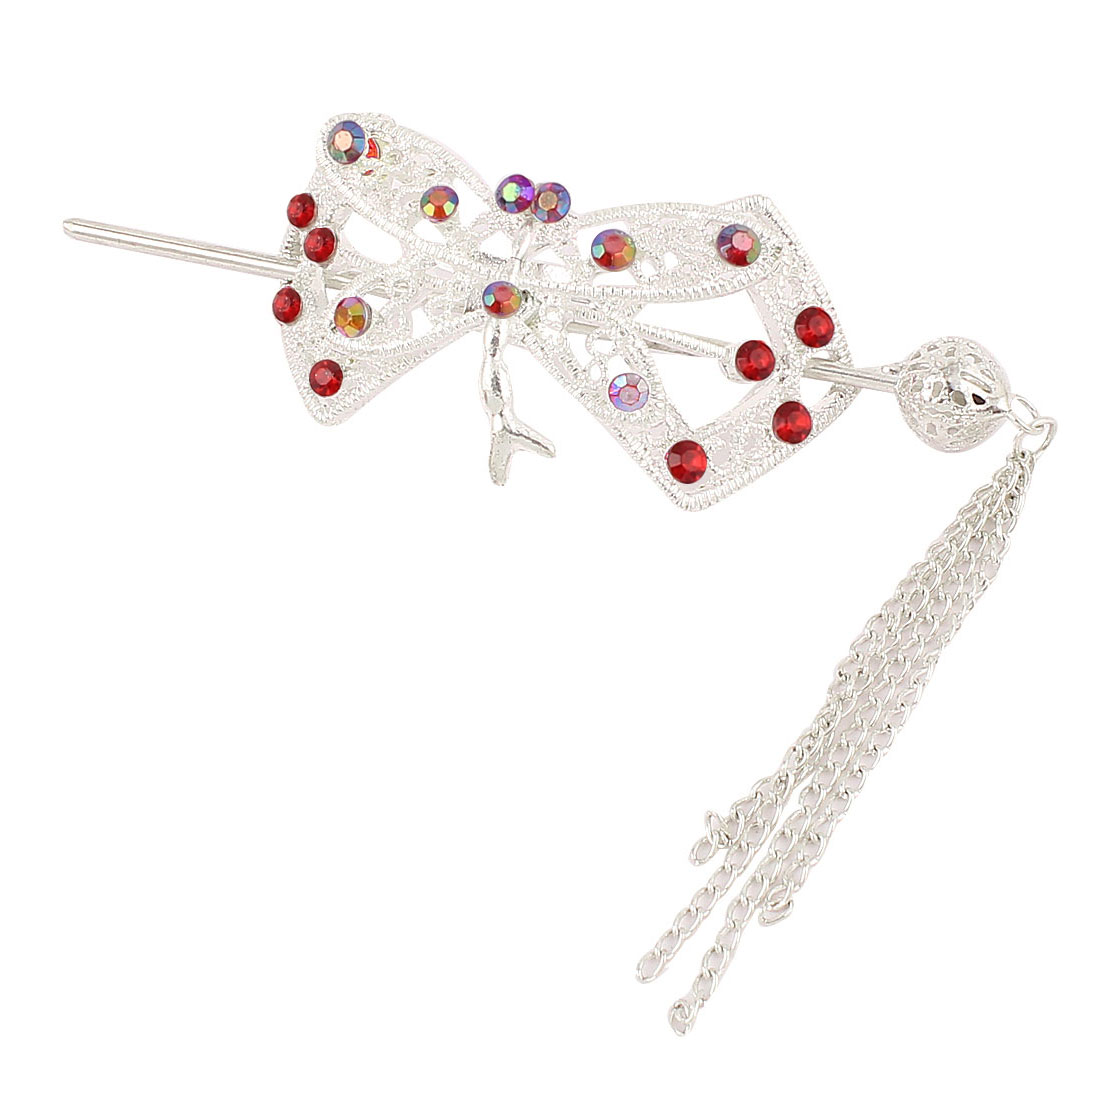 Wedding Red Rhinestone Inlaid Metallic Ponytail Hairpin Barrette Hair Stick